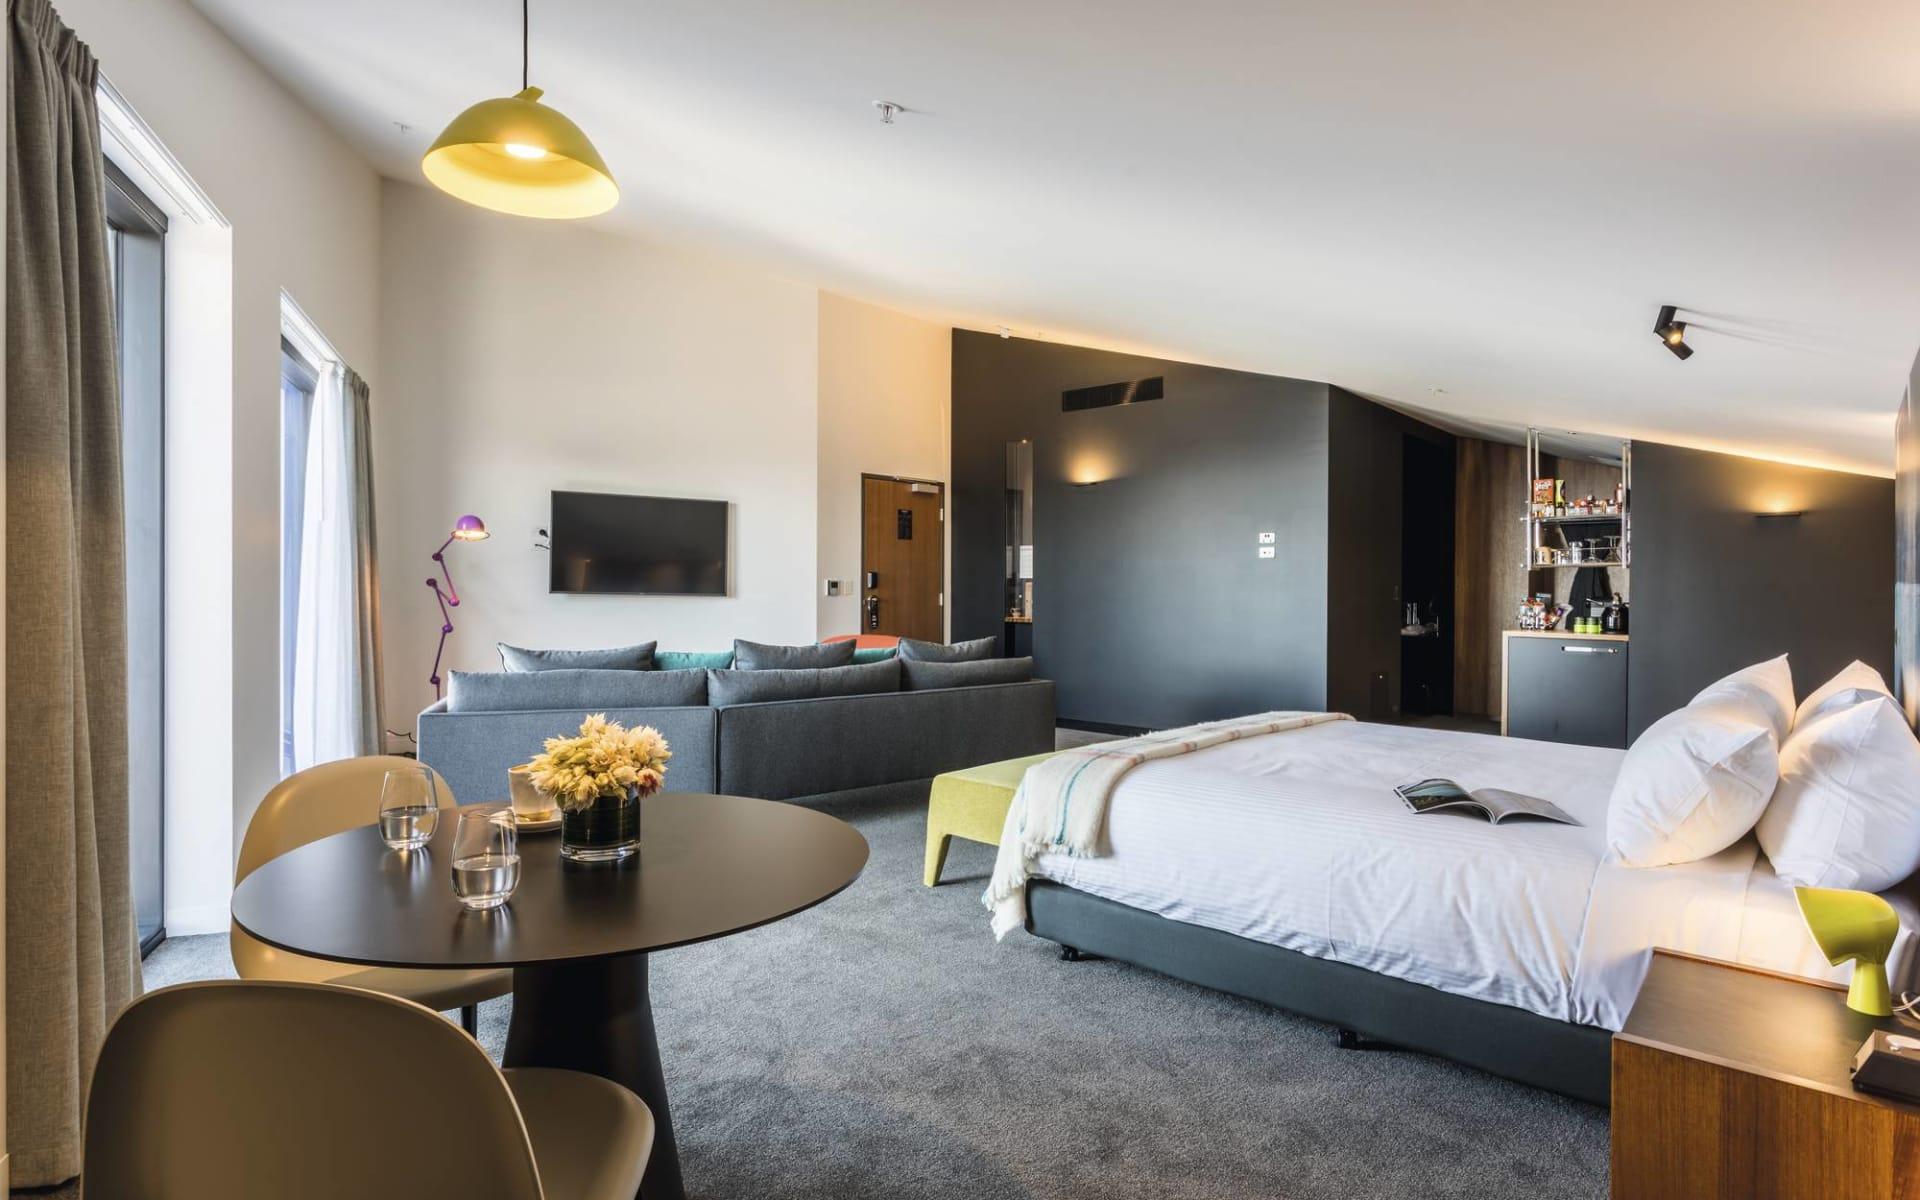 Macq 01 in Hobart:  MACq01 Hobart - Superior Corner Suite 2017